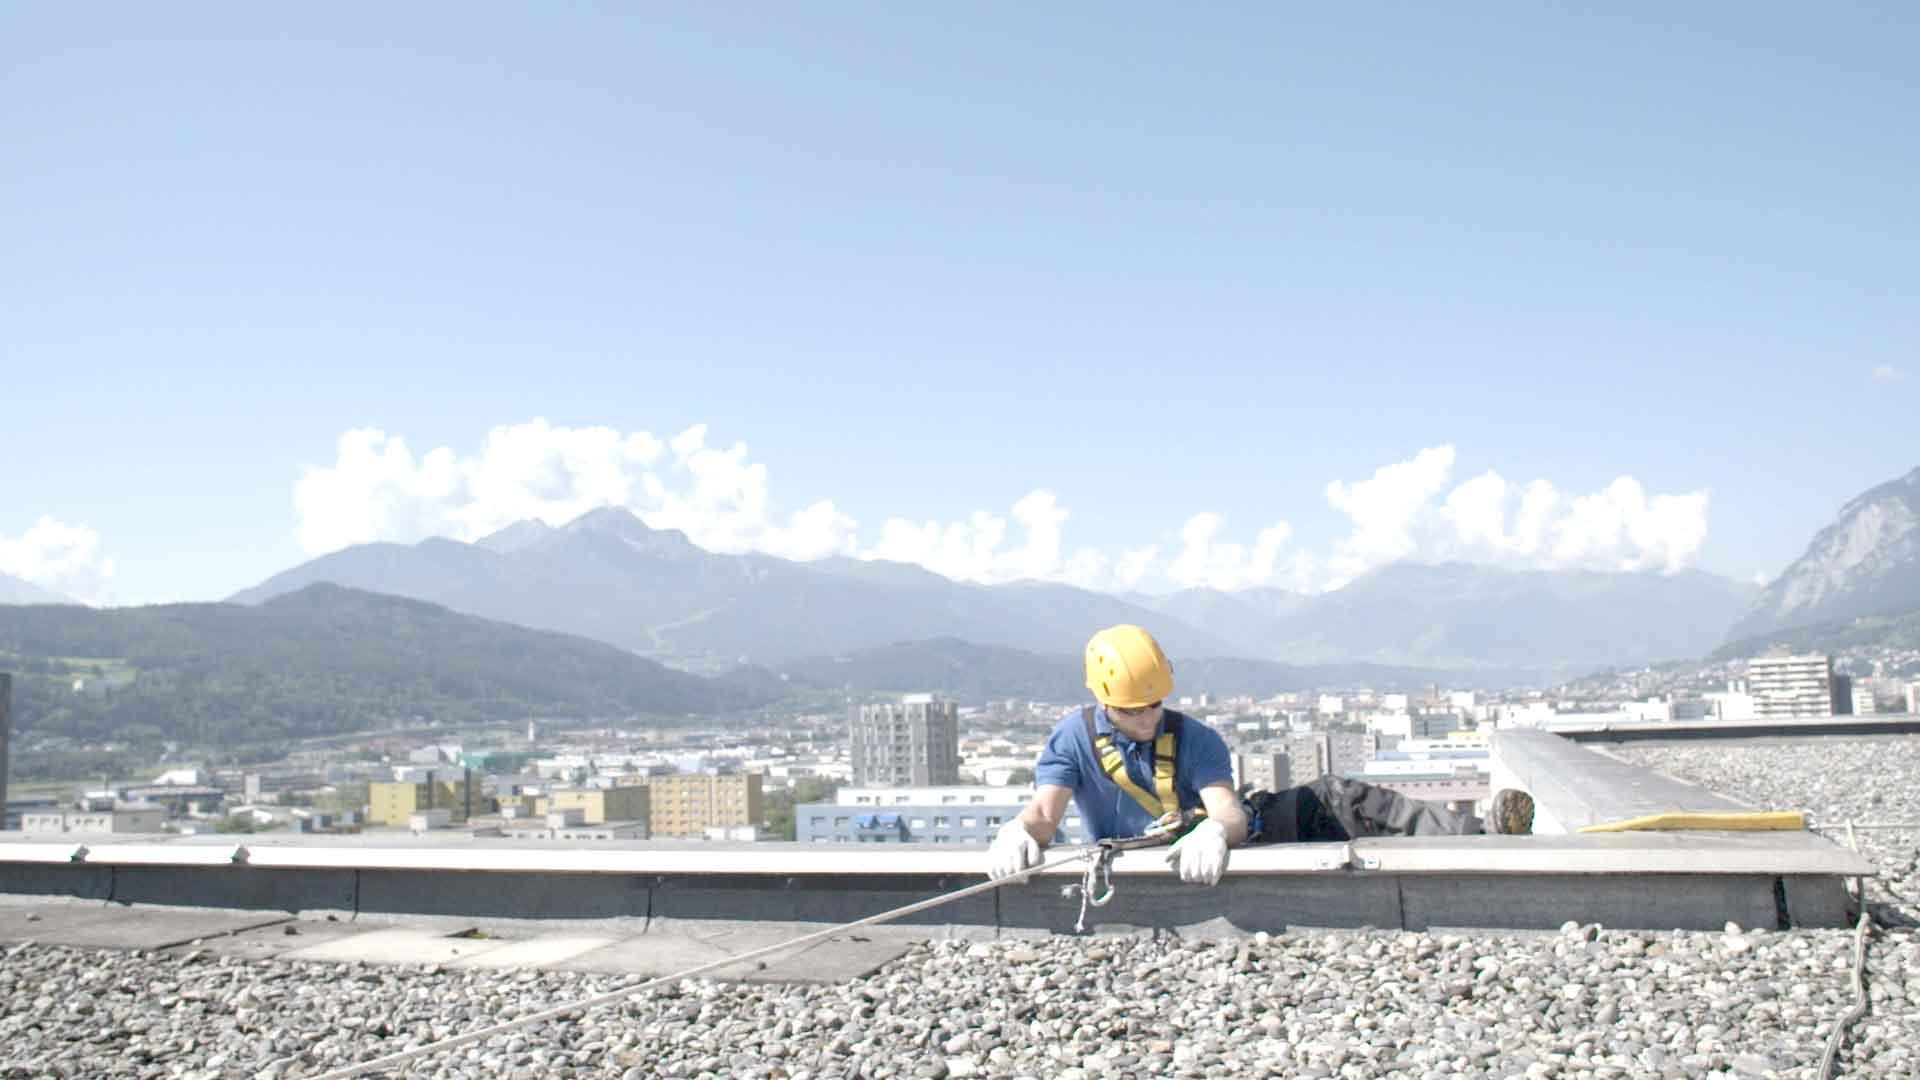 innsbruck höhenarbeit dach